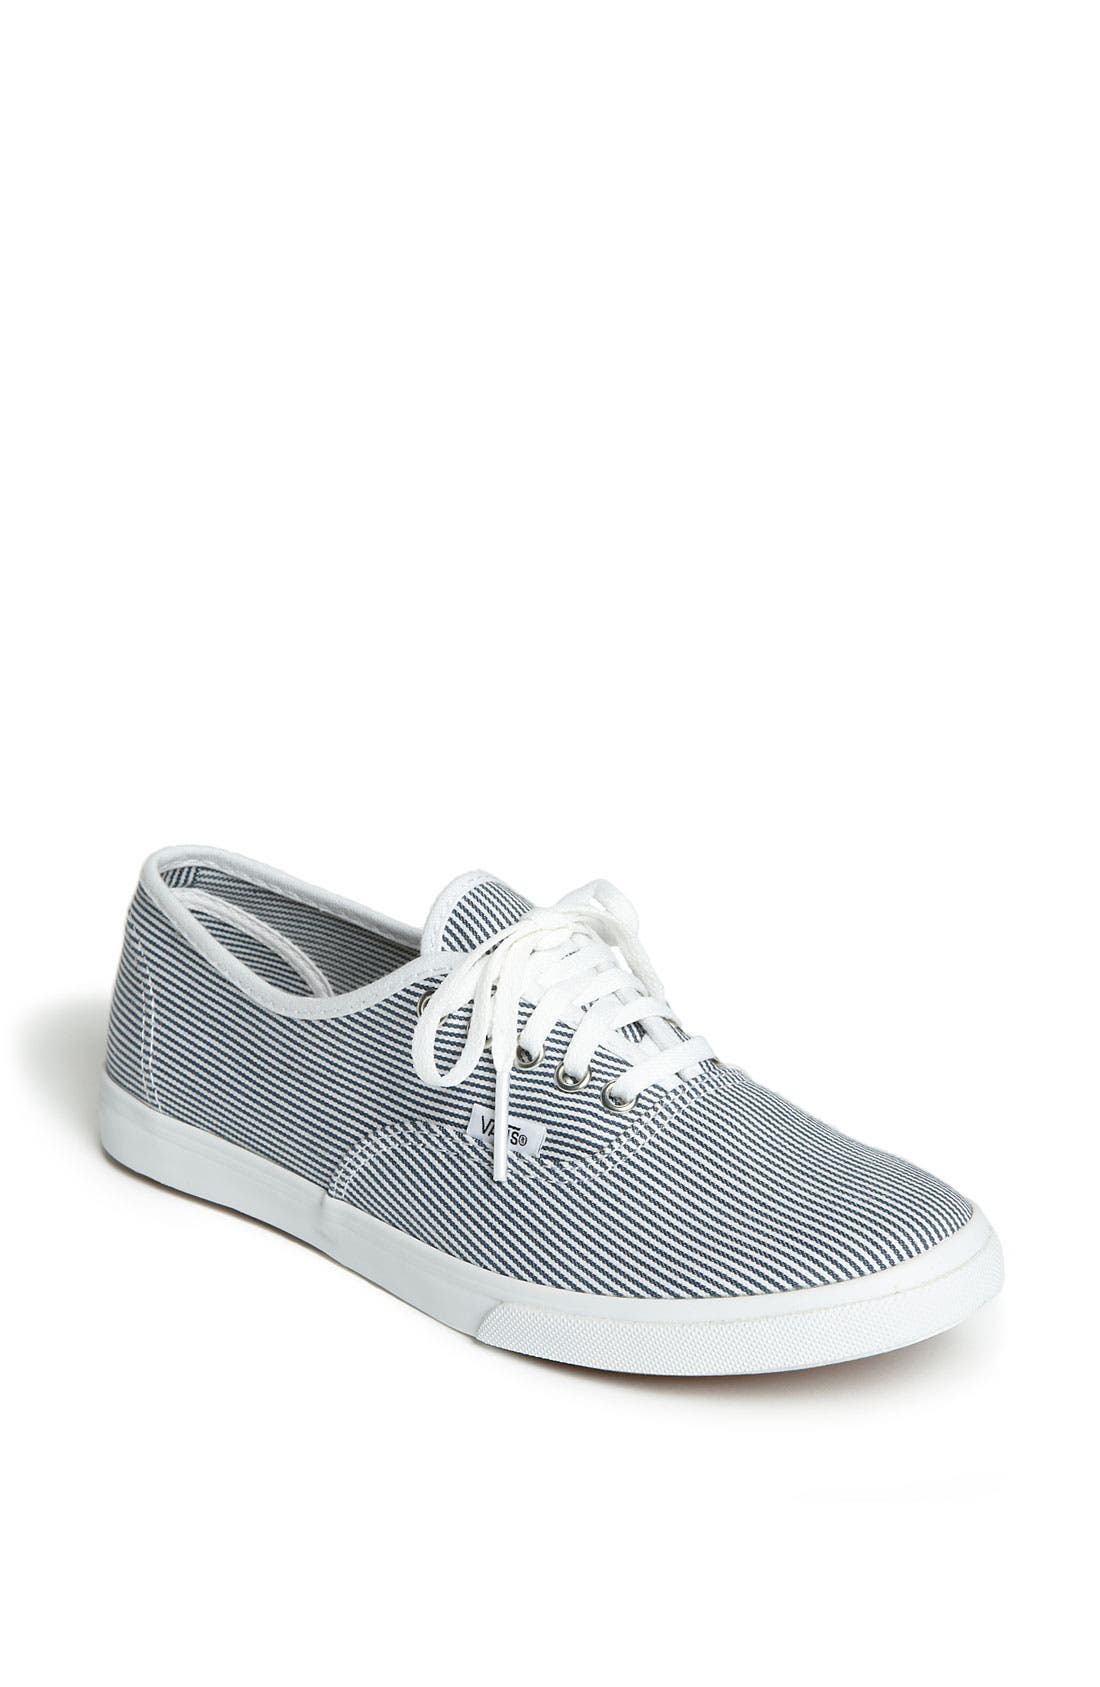 Main Image - Vans 'Authentic Lo Pro' Sneaker (Women)